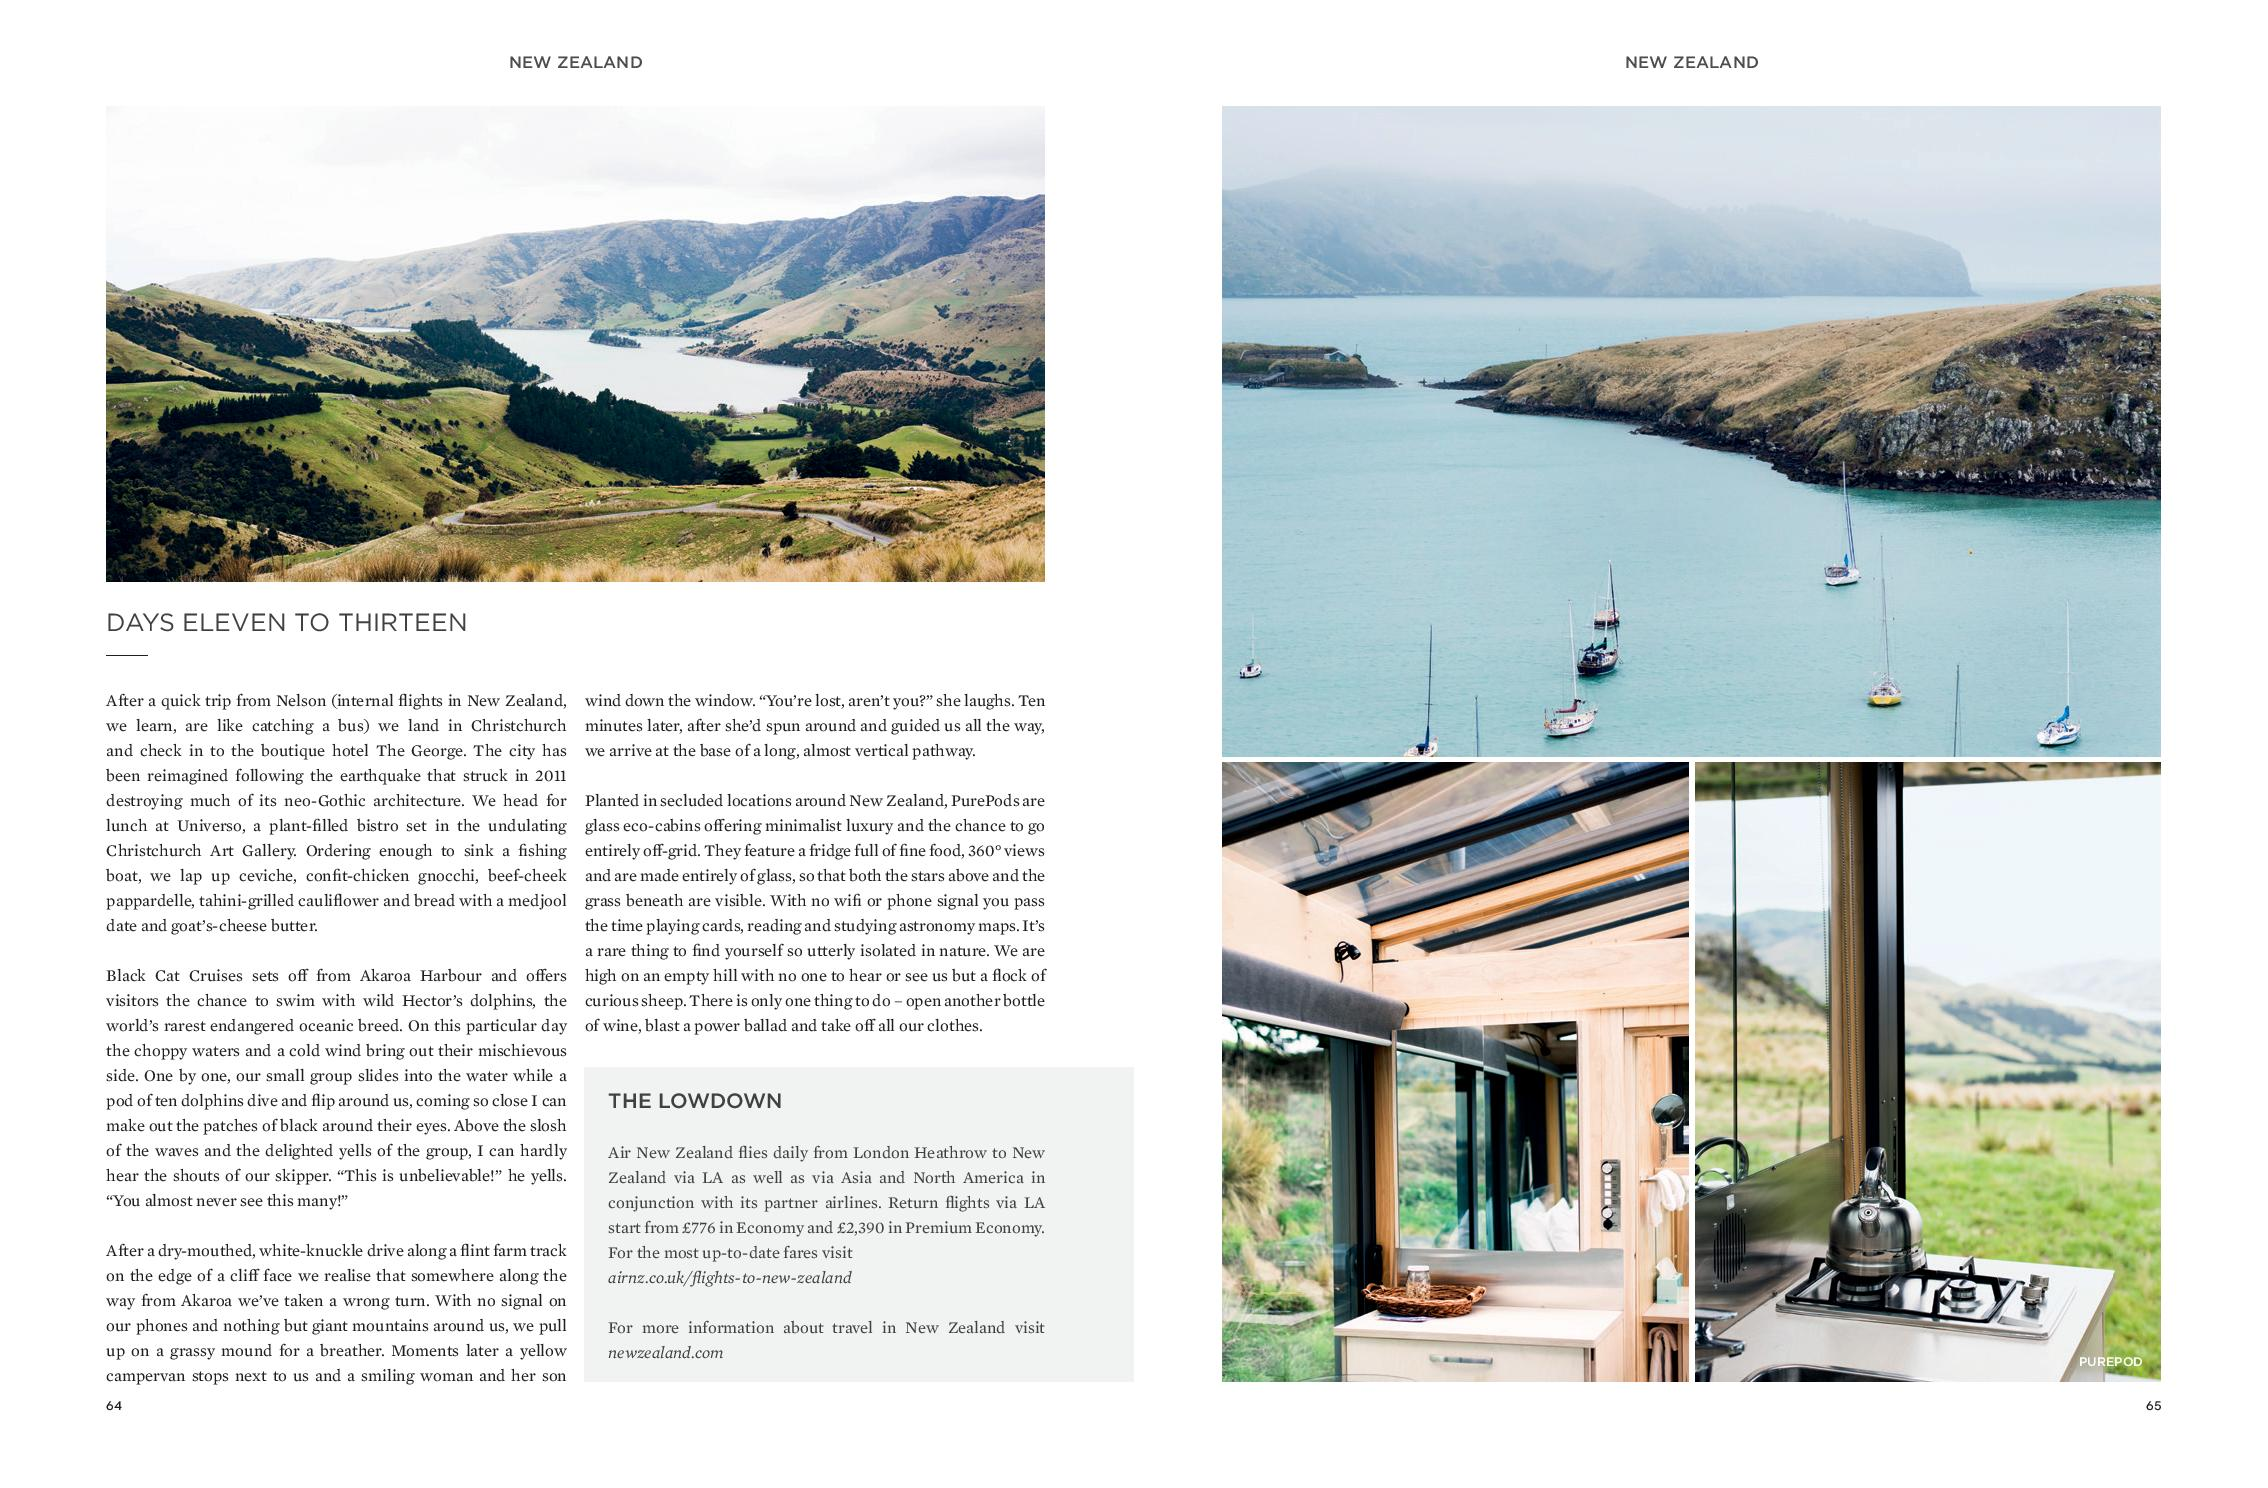 054-067-New_Zealand-page-007.jpg